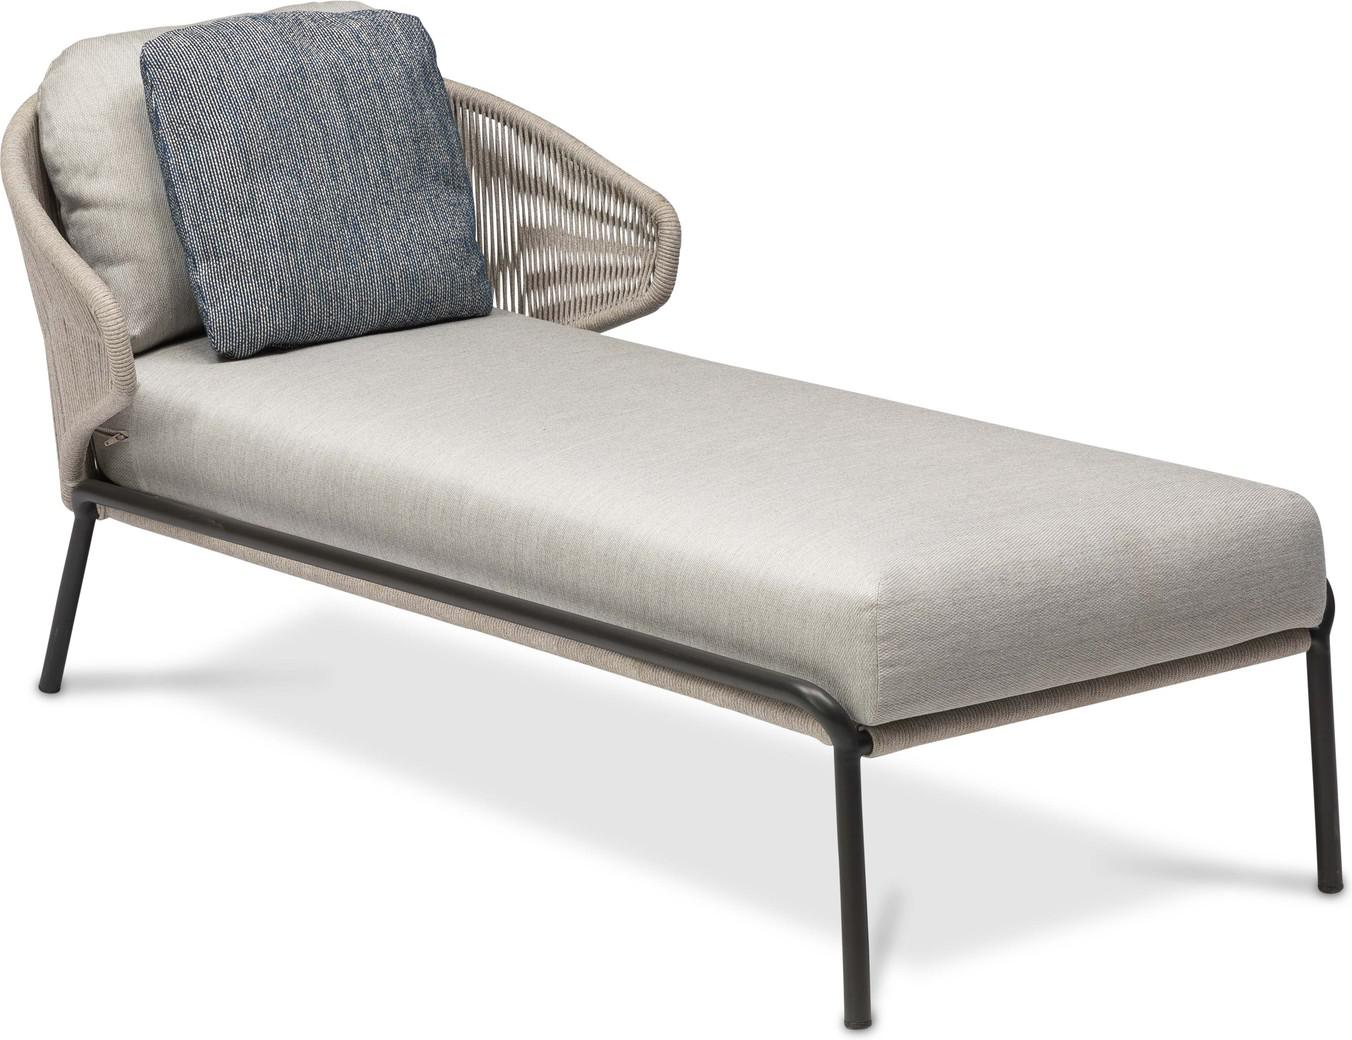 Radius Chaise longue - lava - silver